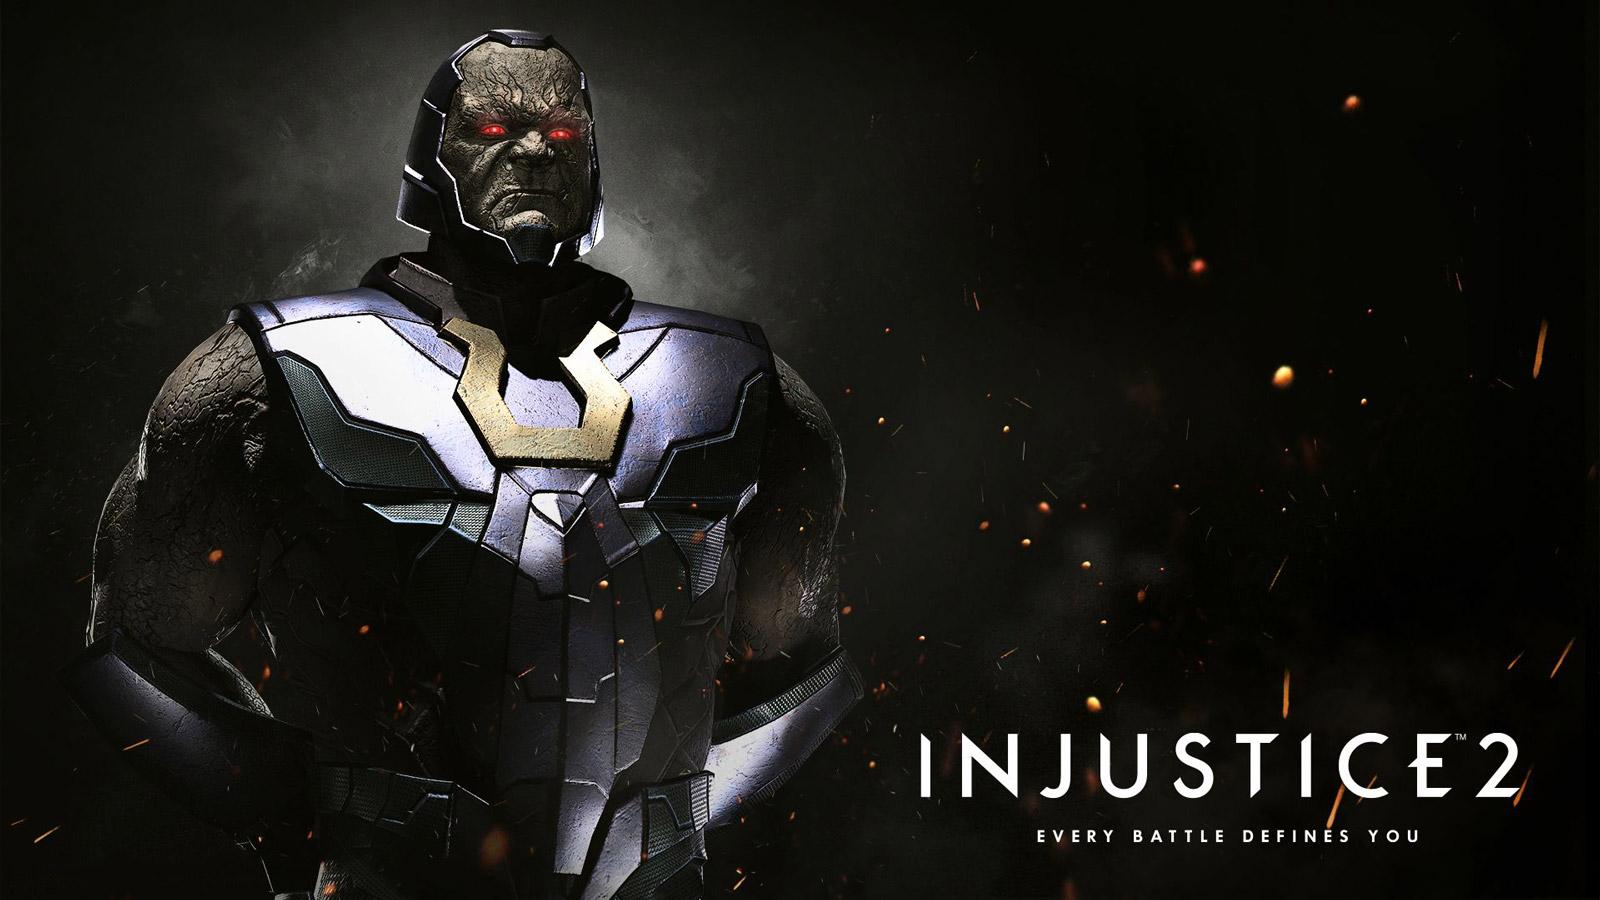 Free Injustice 2 Wallpaper in 1600x900